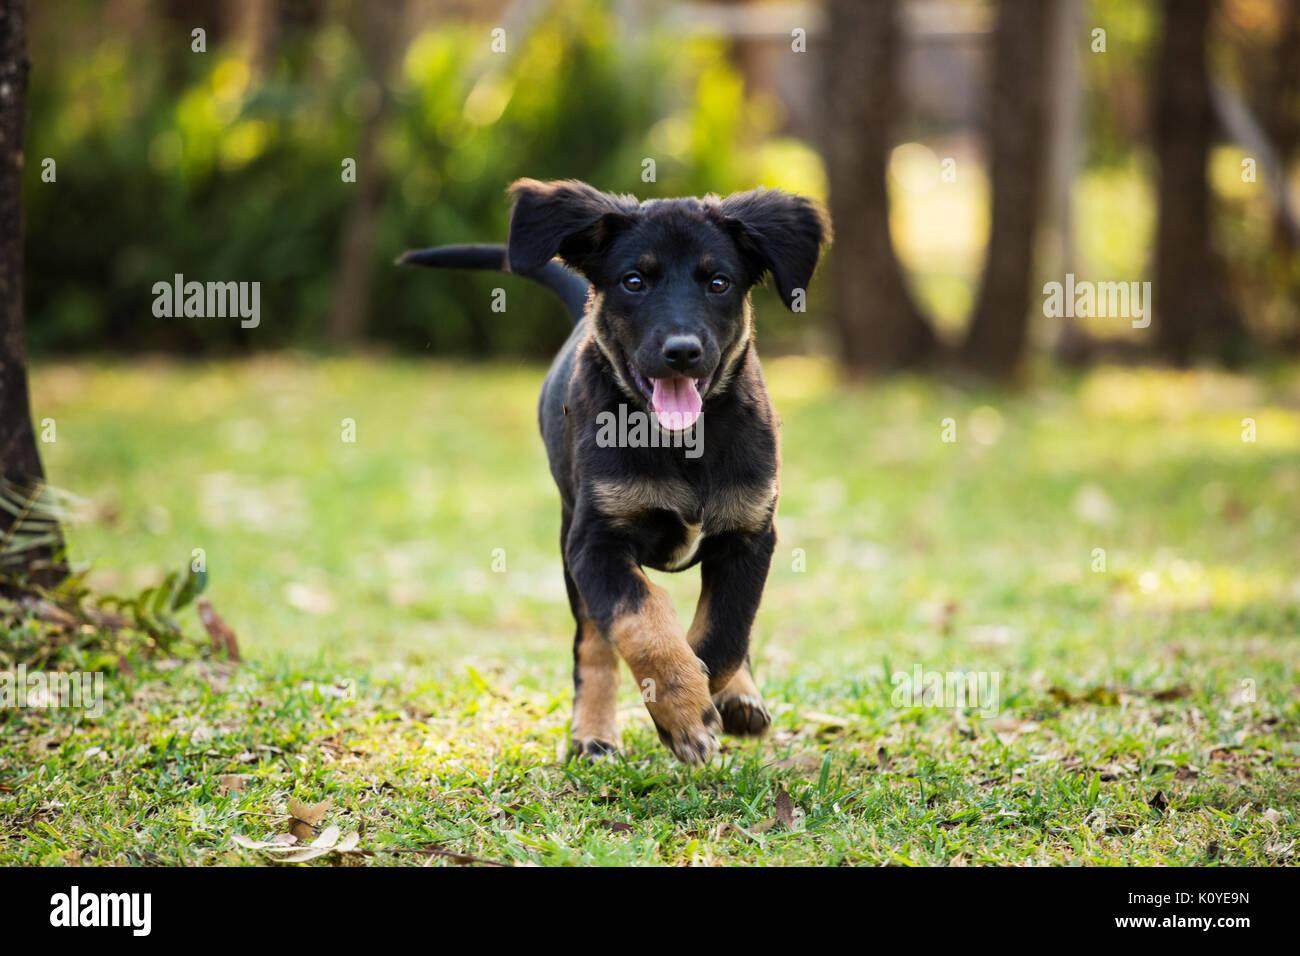 A German Sheprador Puppy Playing In The Backyard Stock Photo